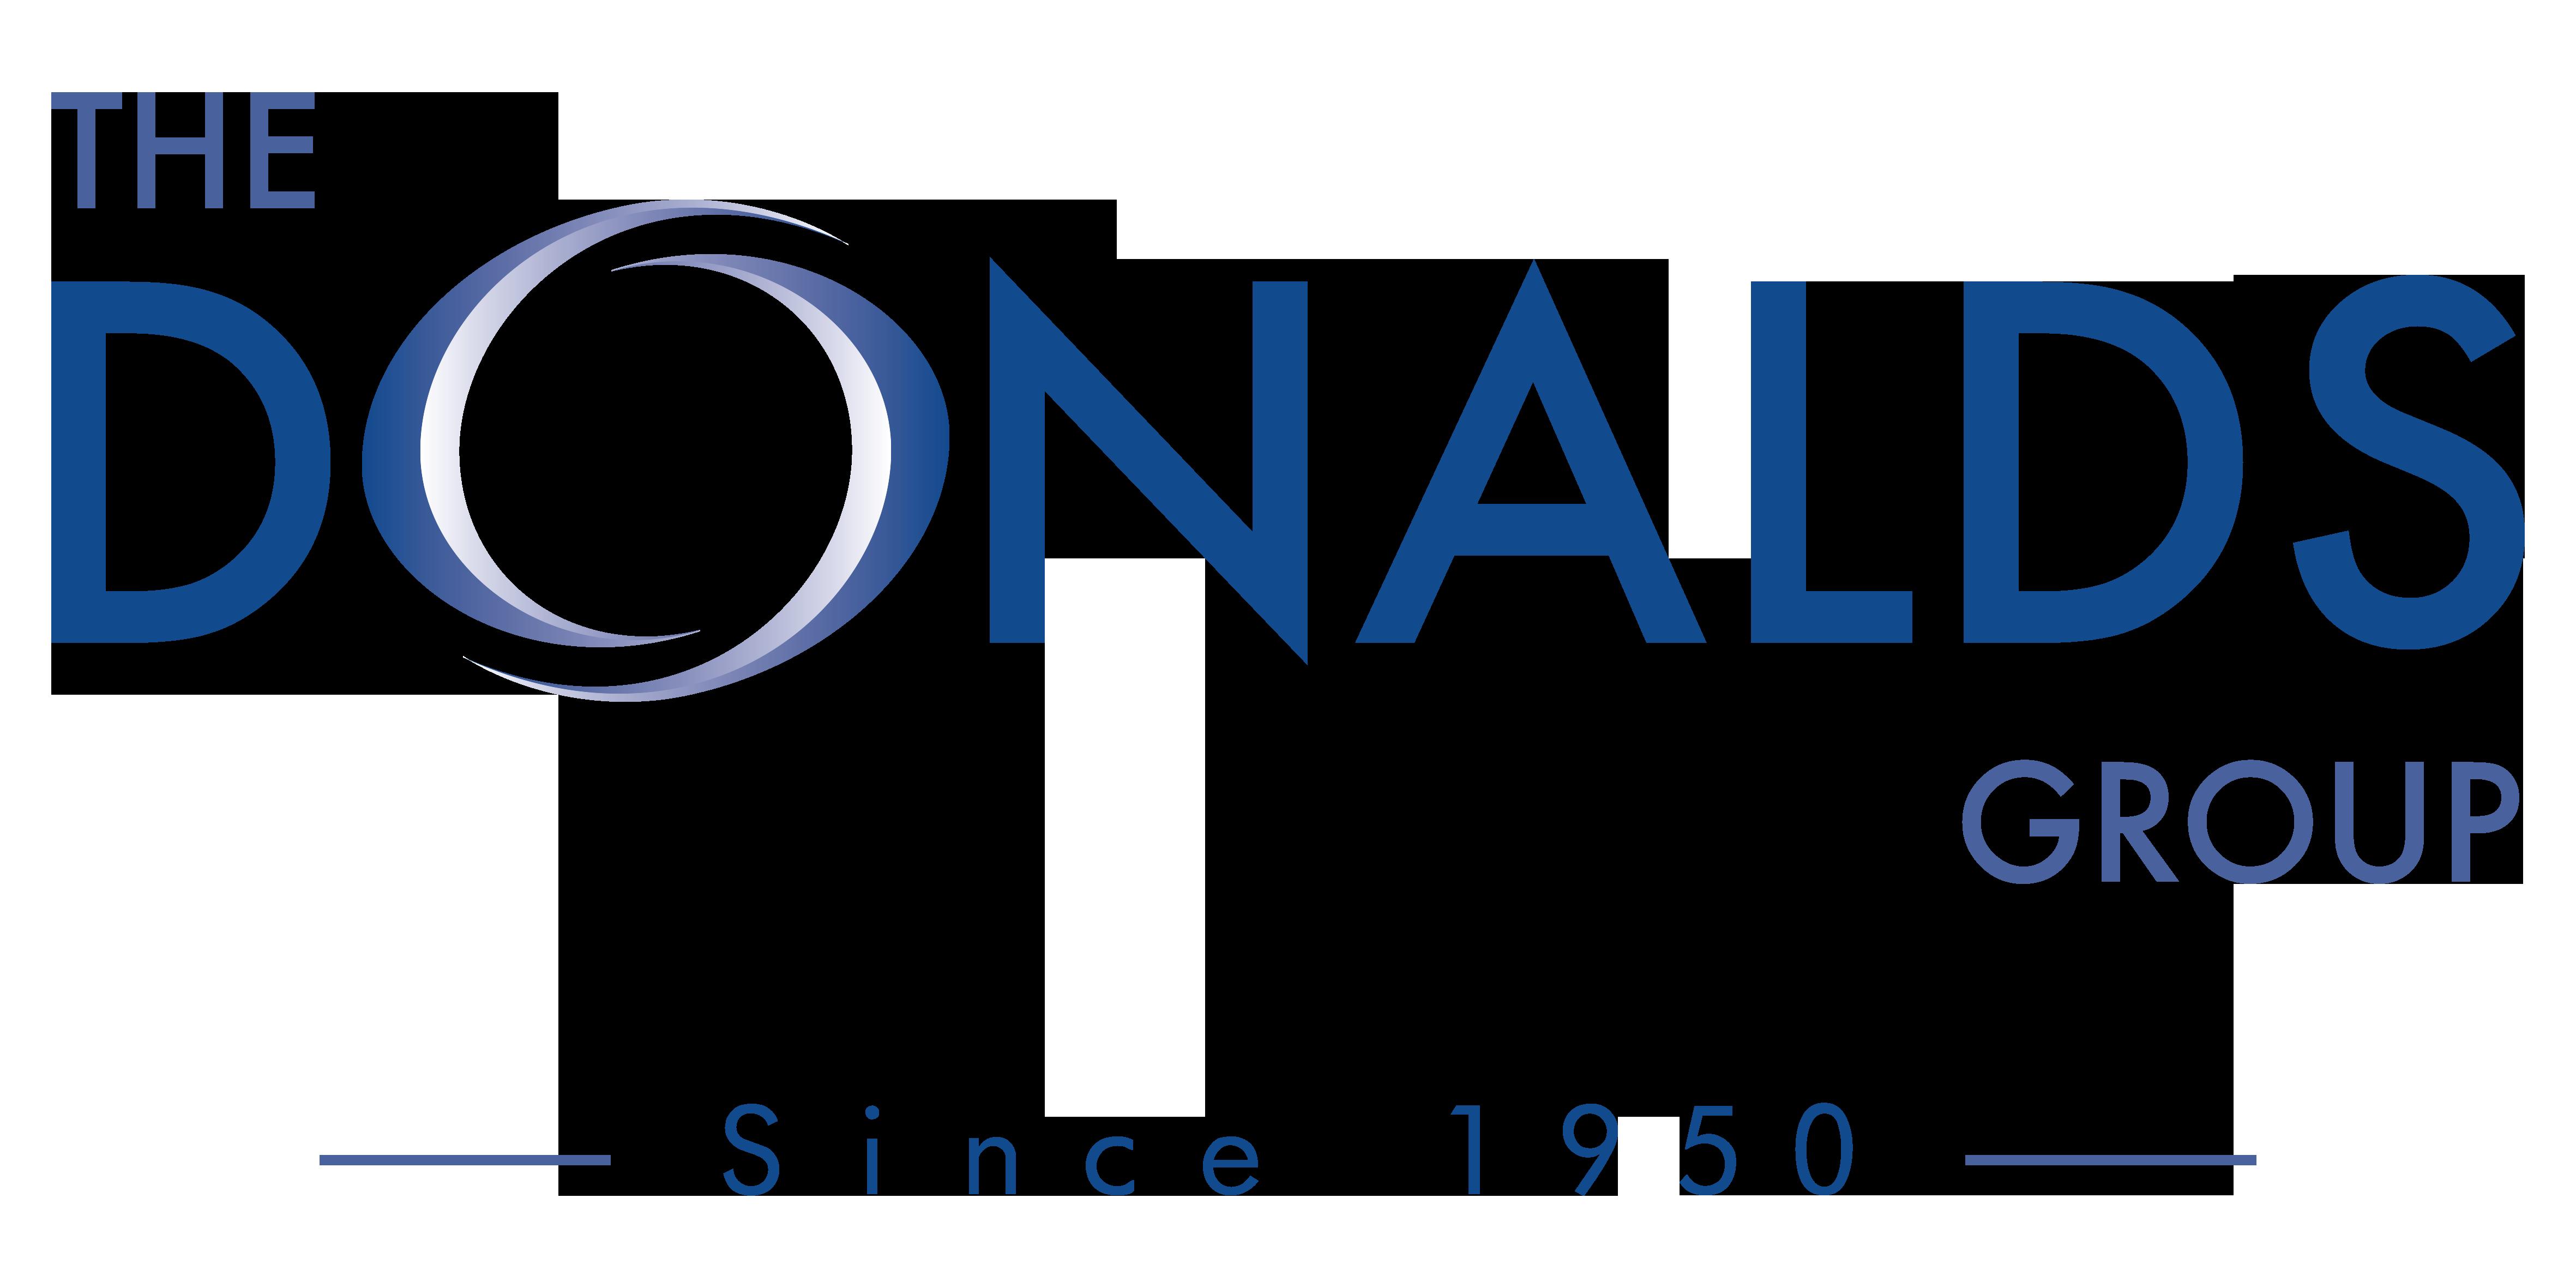 The Donalds Group logo